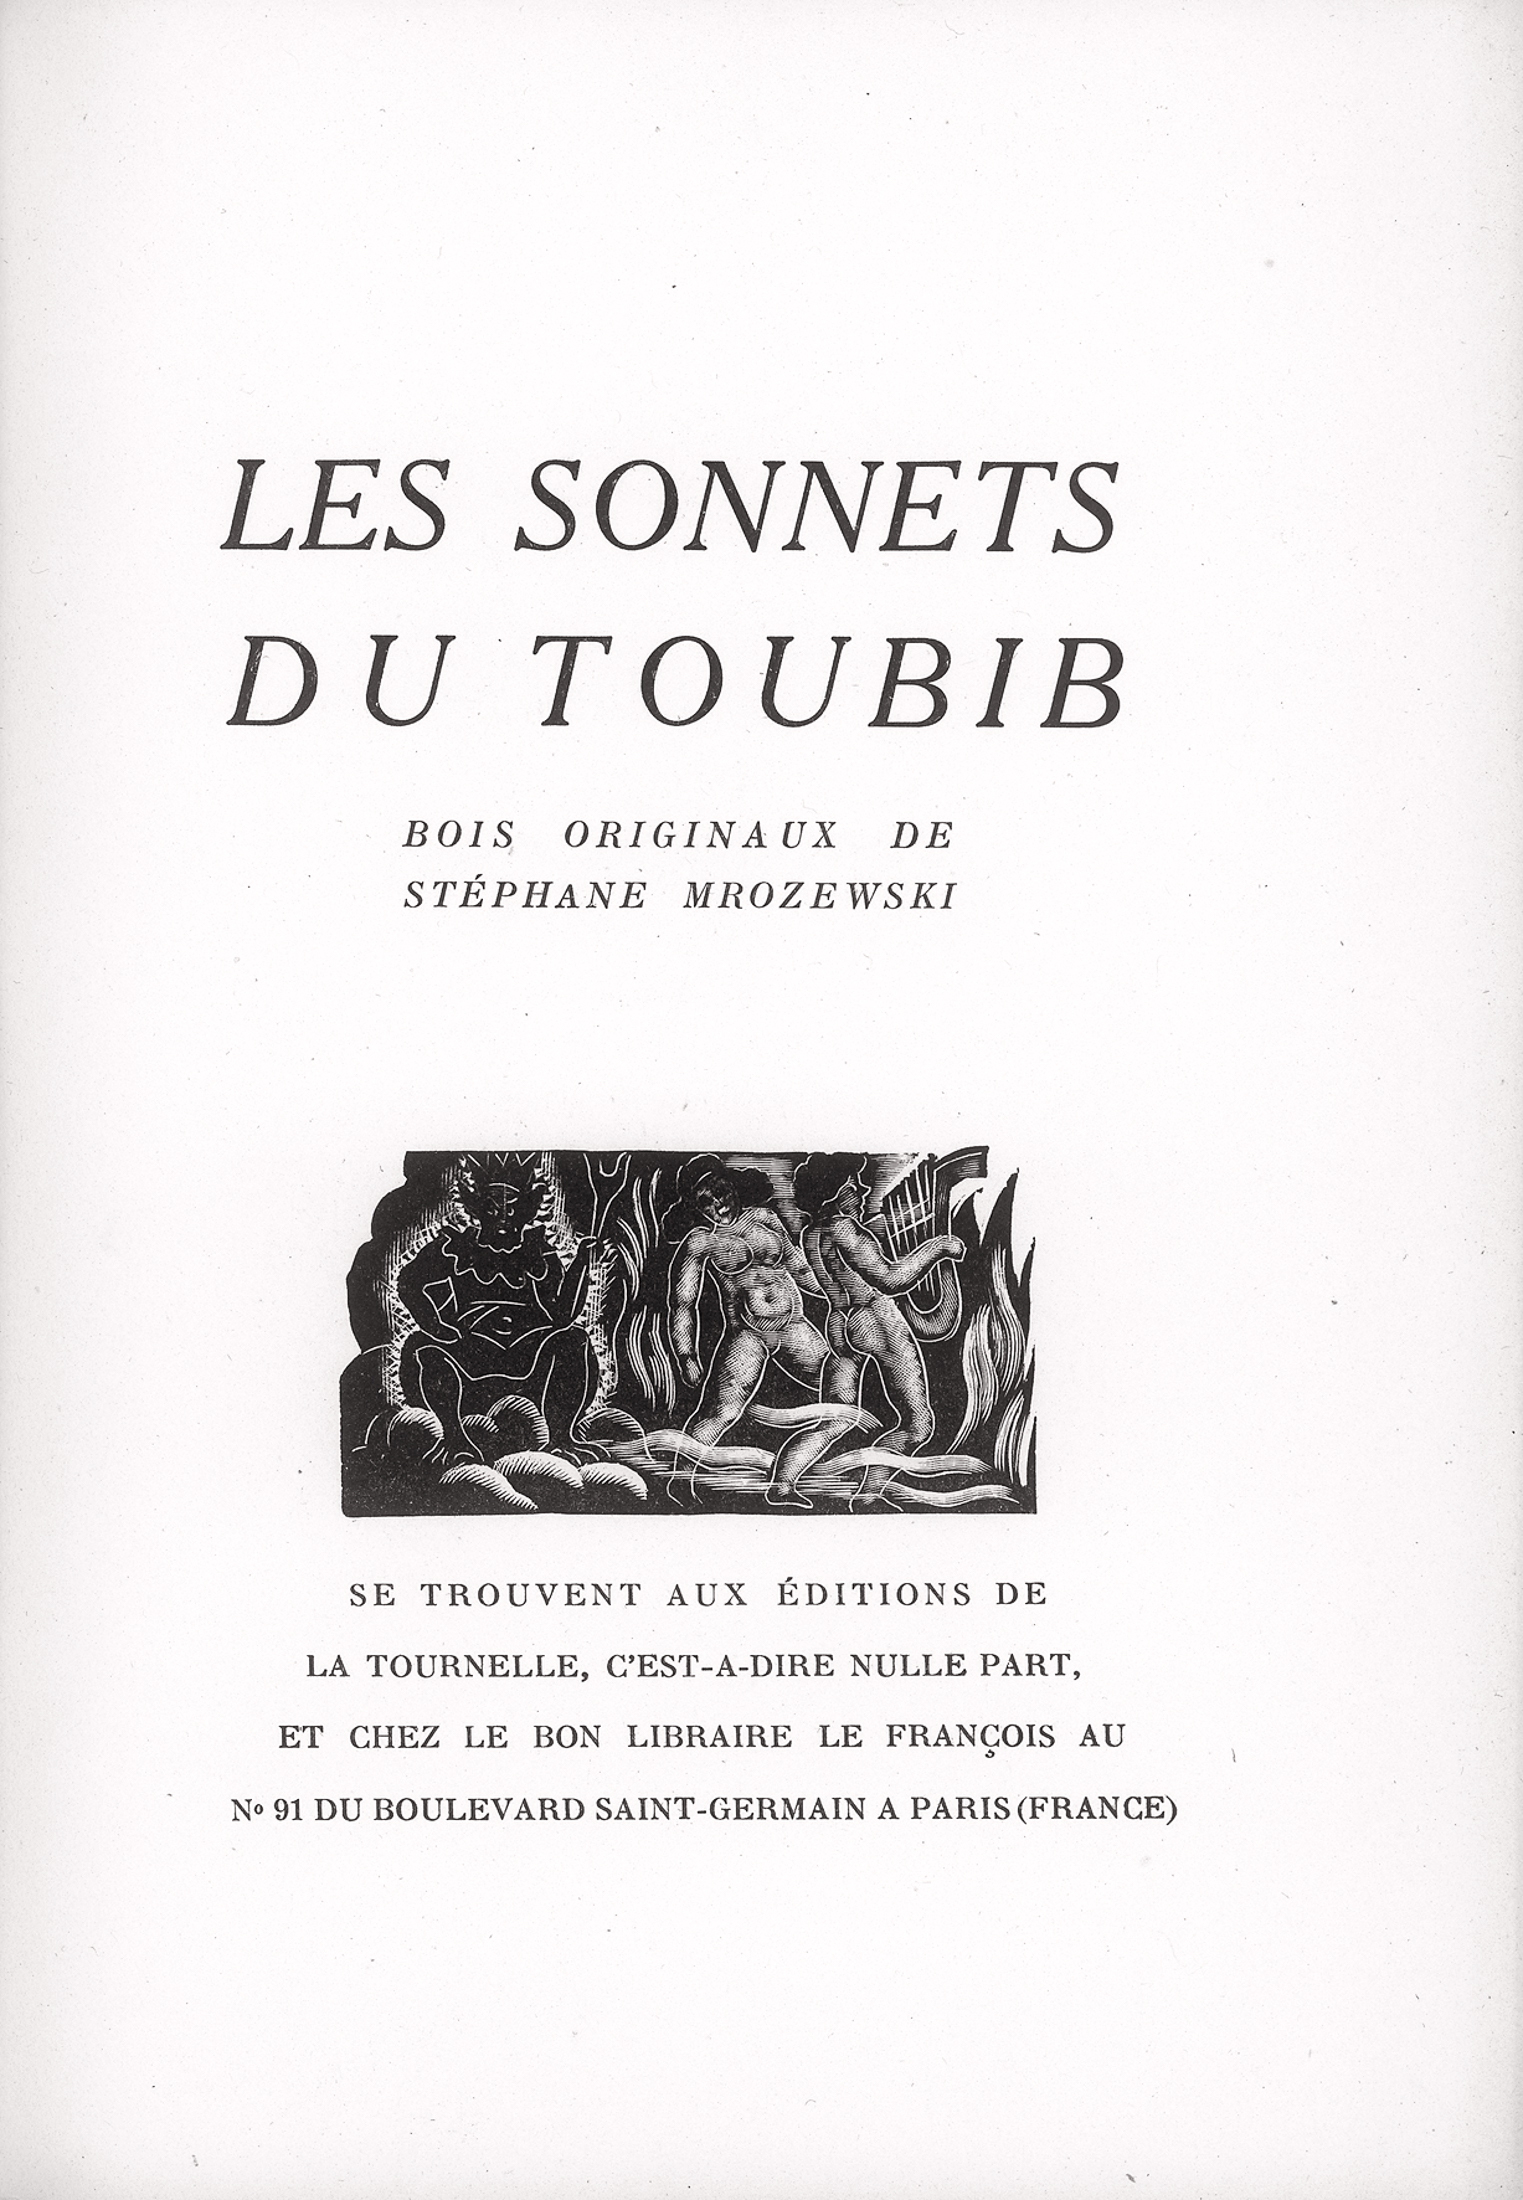 Les sonnets du Toubib. Bois originaux de Stephane Mrozewski, 1946